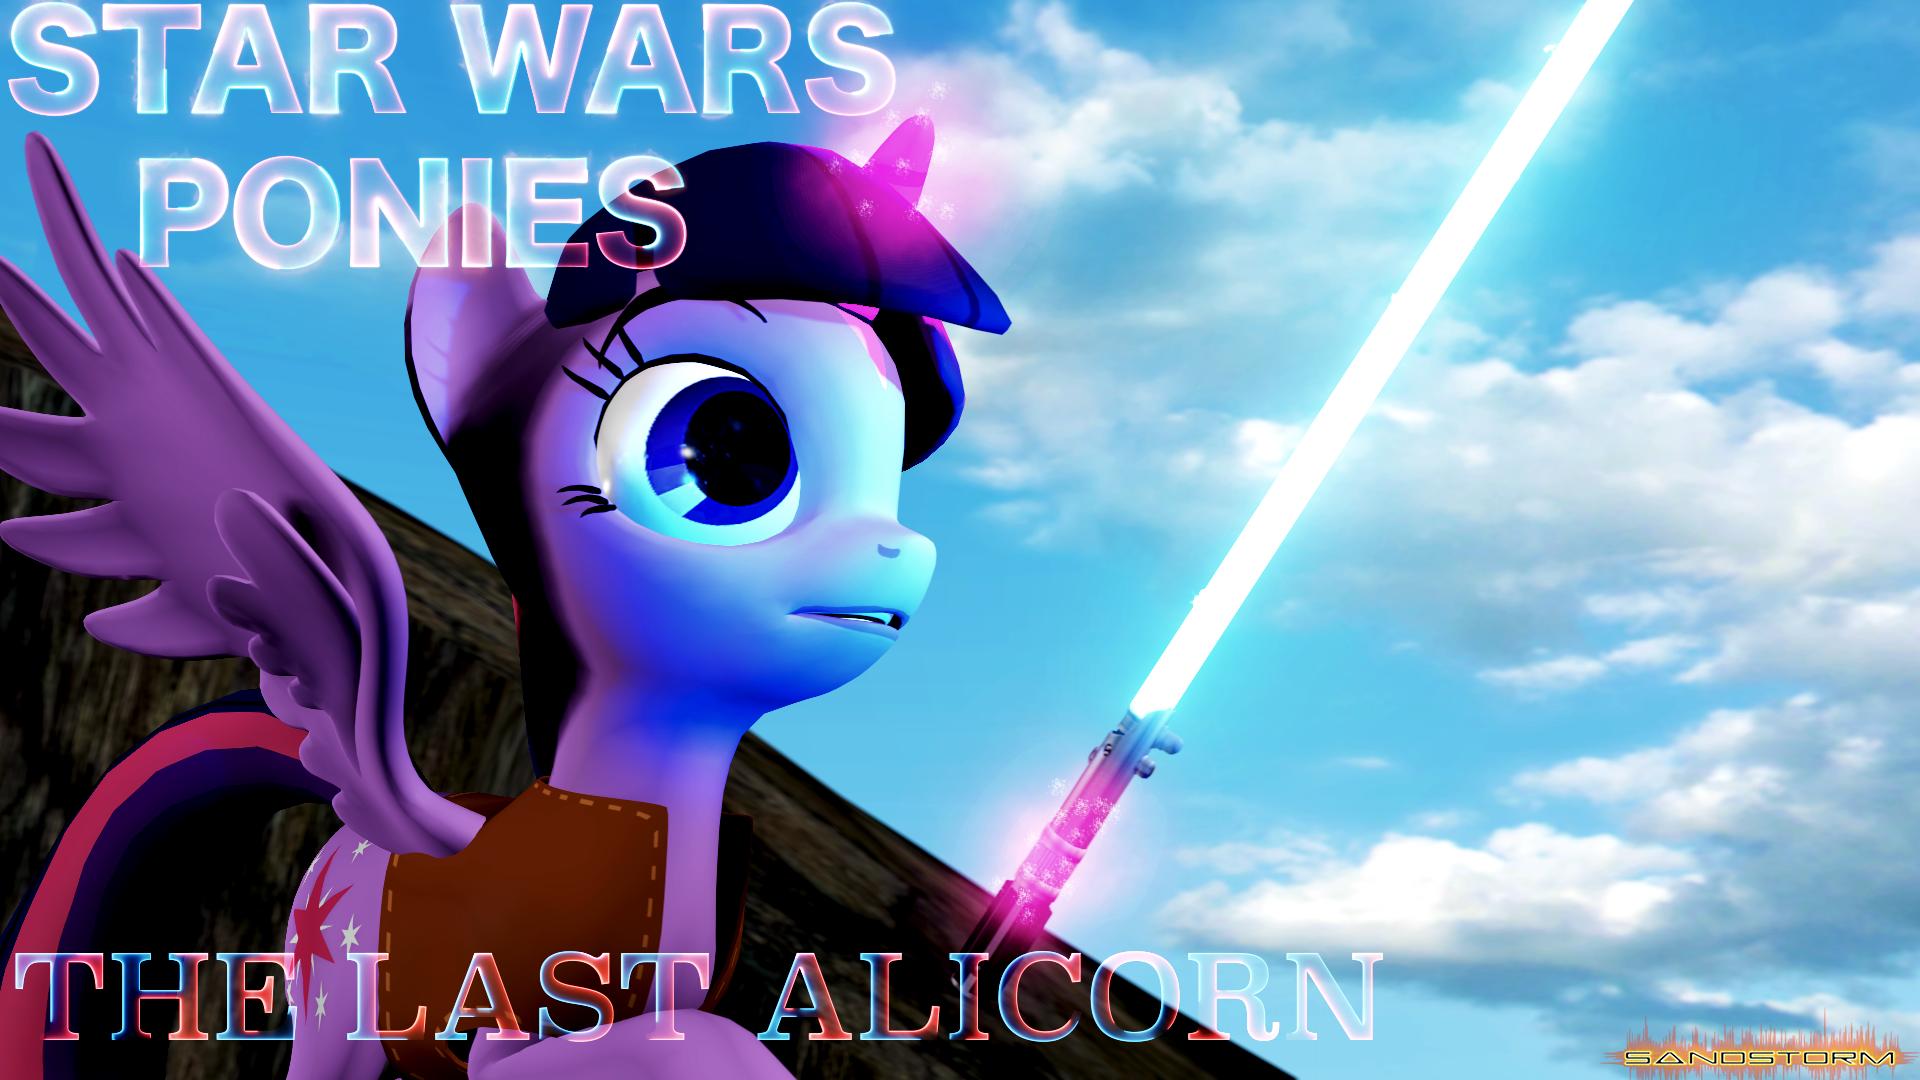 Star Wars Ponies: The Last Alicorn [SFM] by Sandstorm-Arts